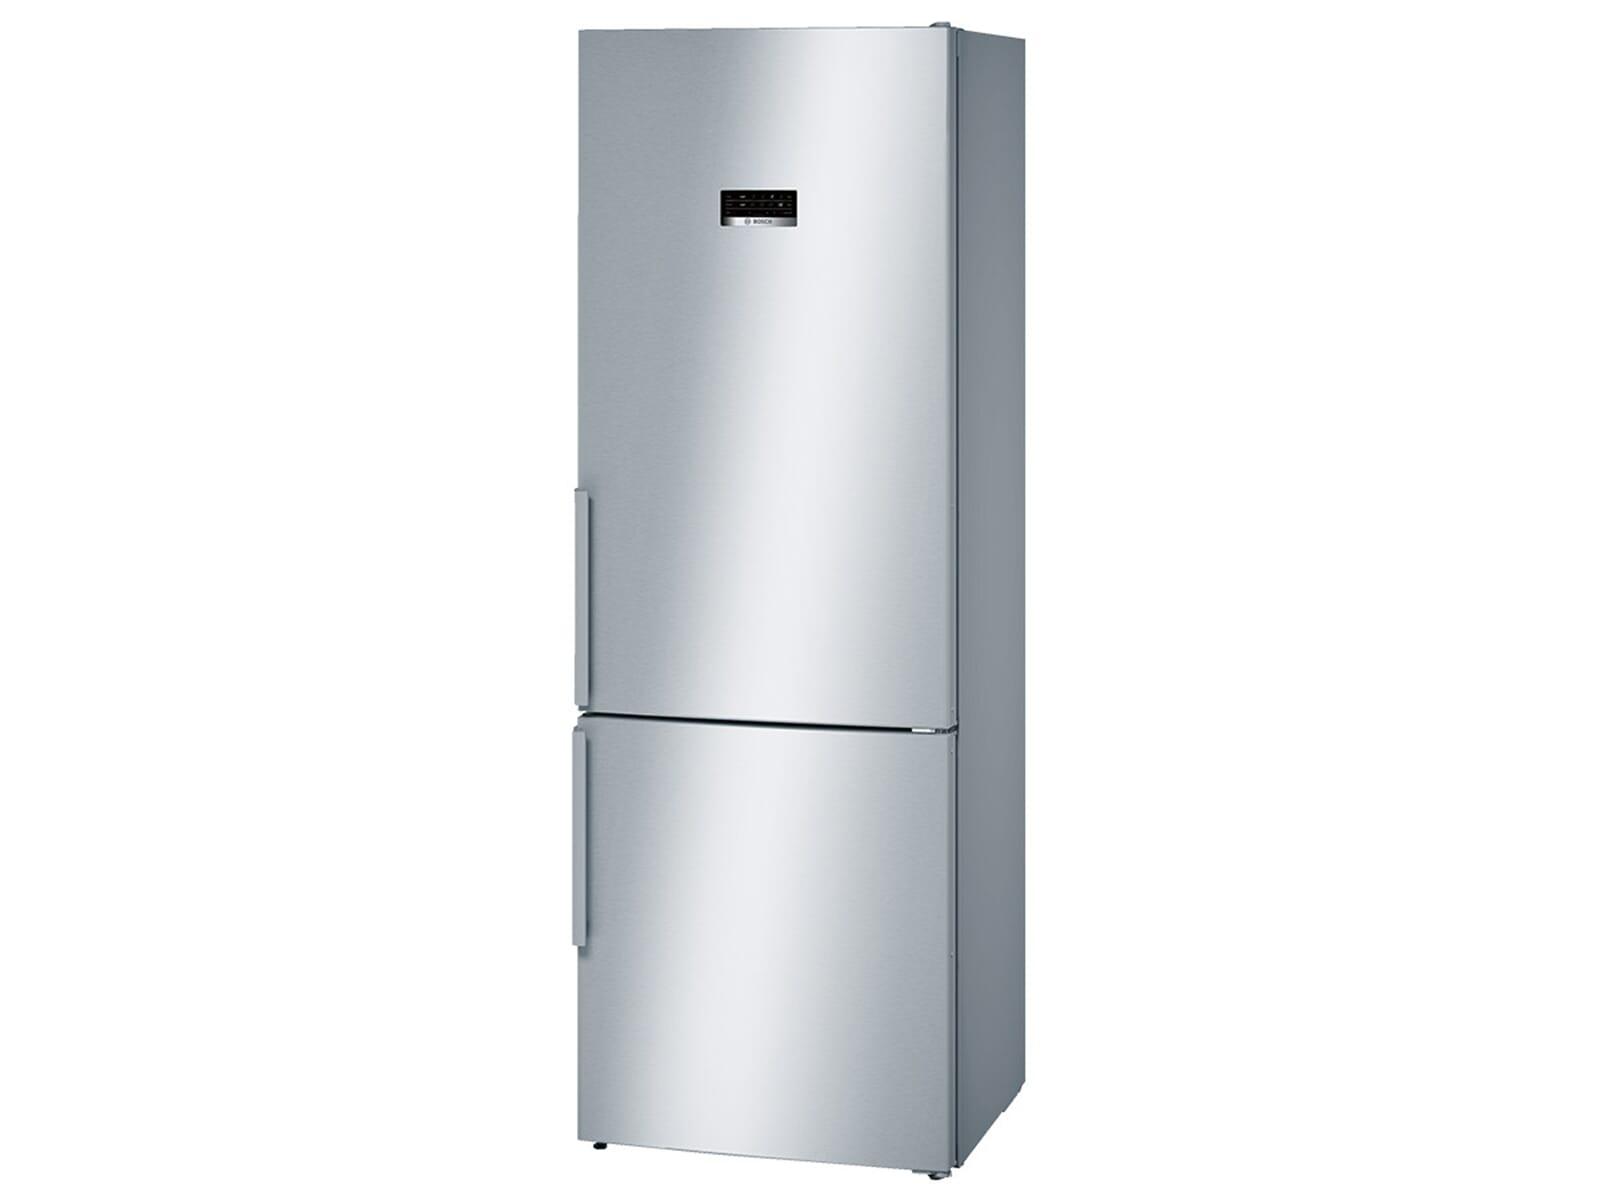 Smeg Kühlschrank Tür Einstellen : Smeg kühlschrank tür einstellen unsere kaufempfehlung für eine